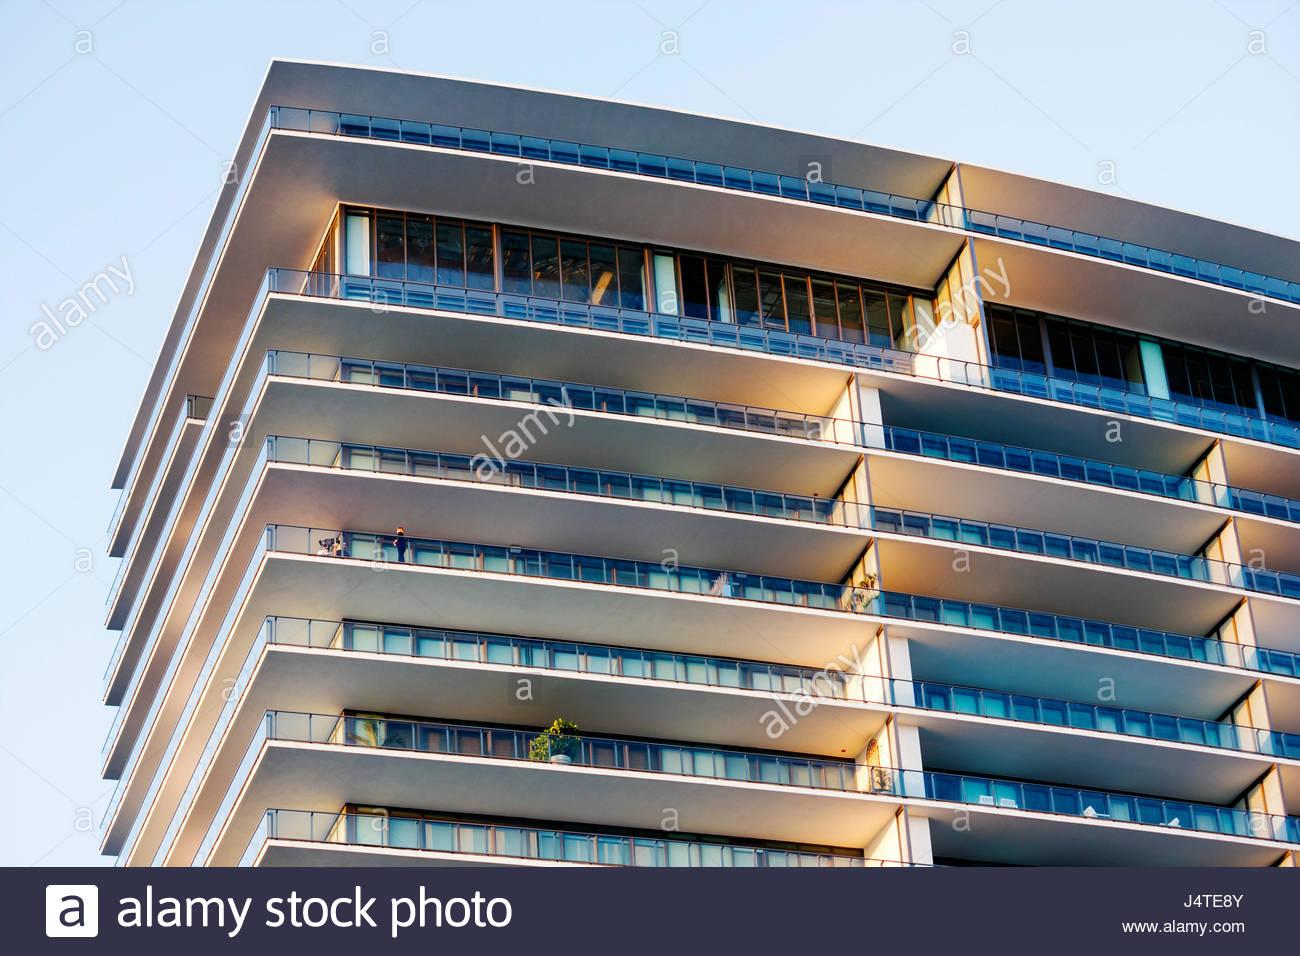 Miami Beach Florida South Pointe Apogee Condominium luxury high-rise high-rise balcony real estate dwelling Sieger - Stock Image